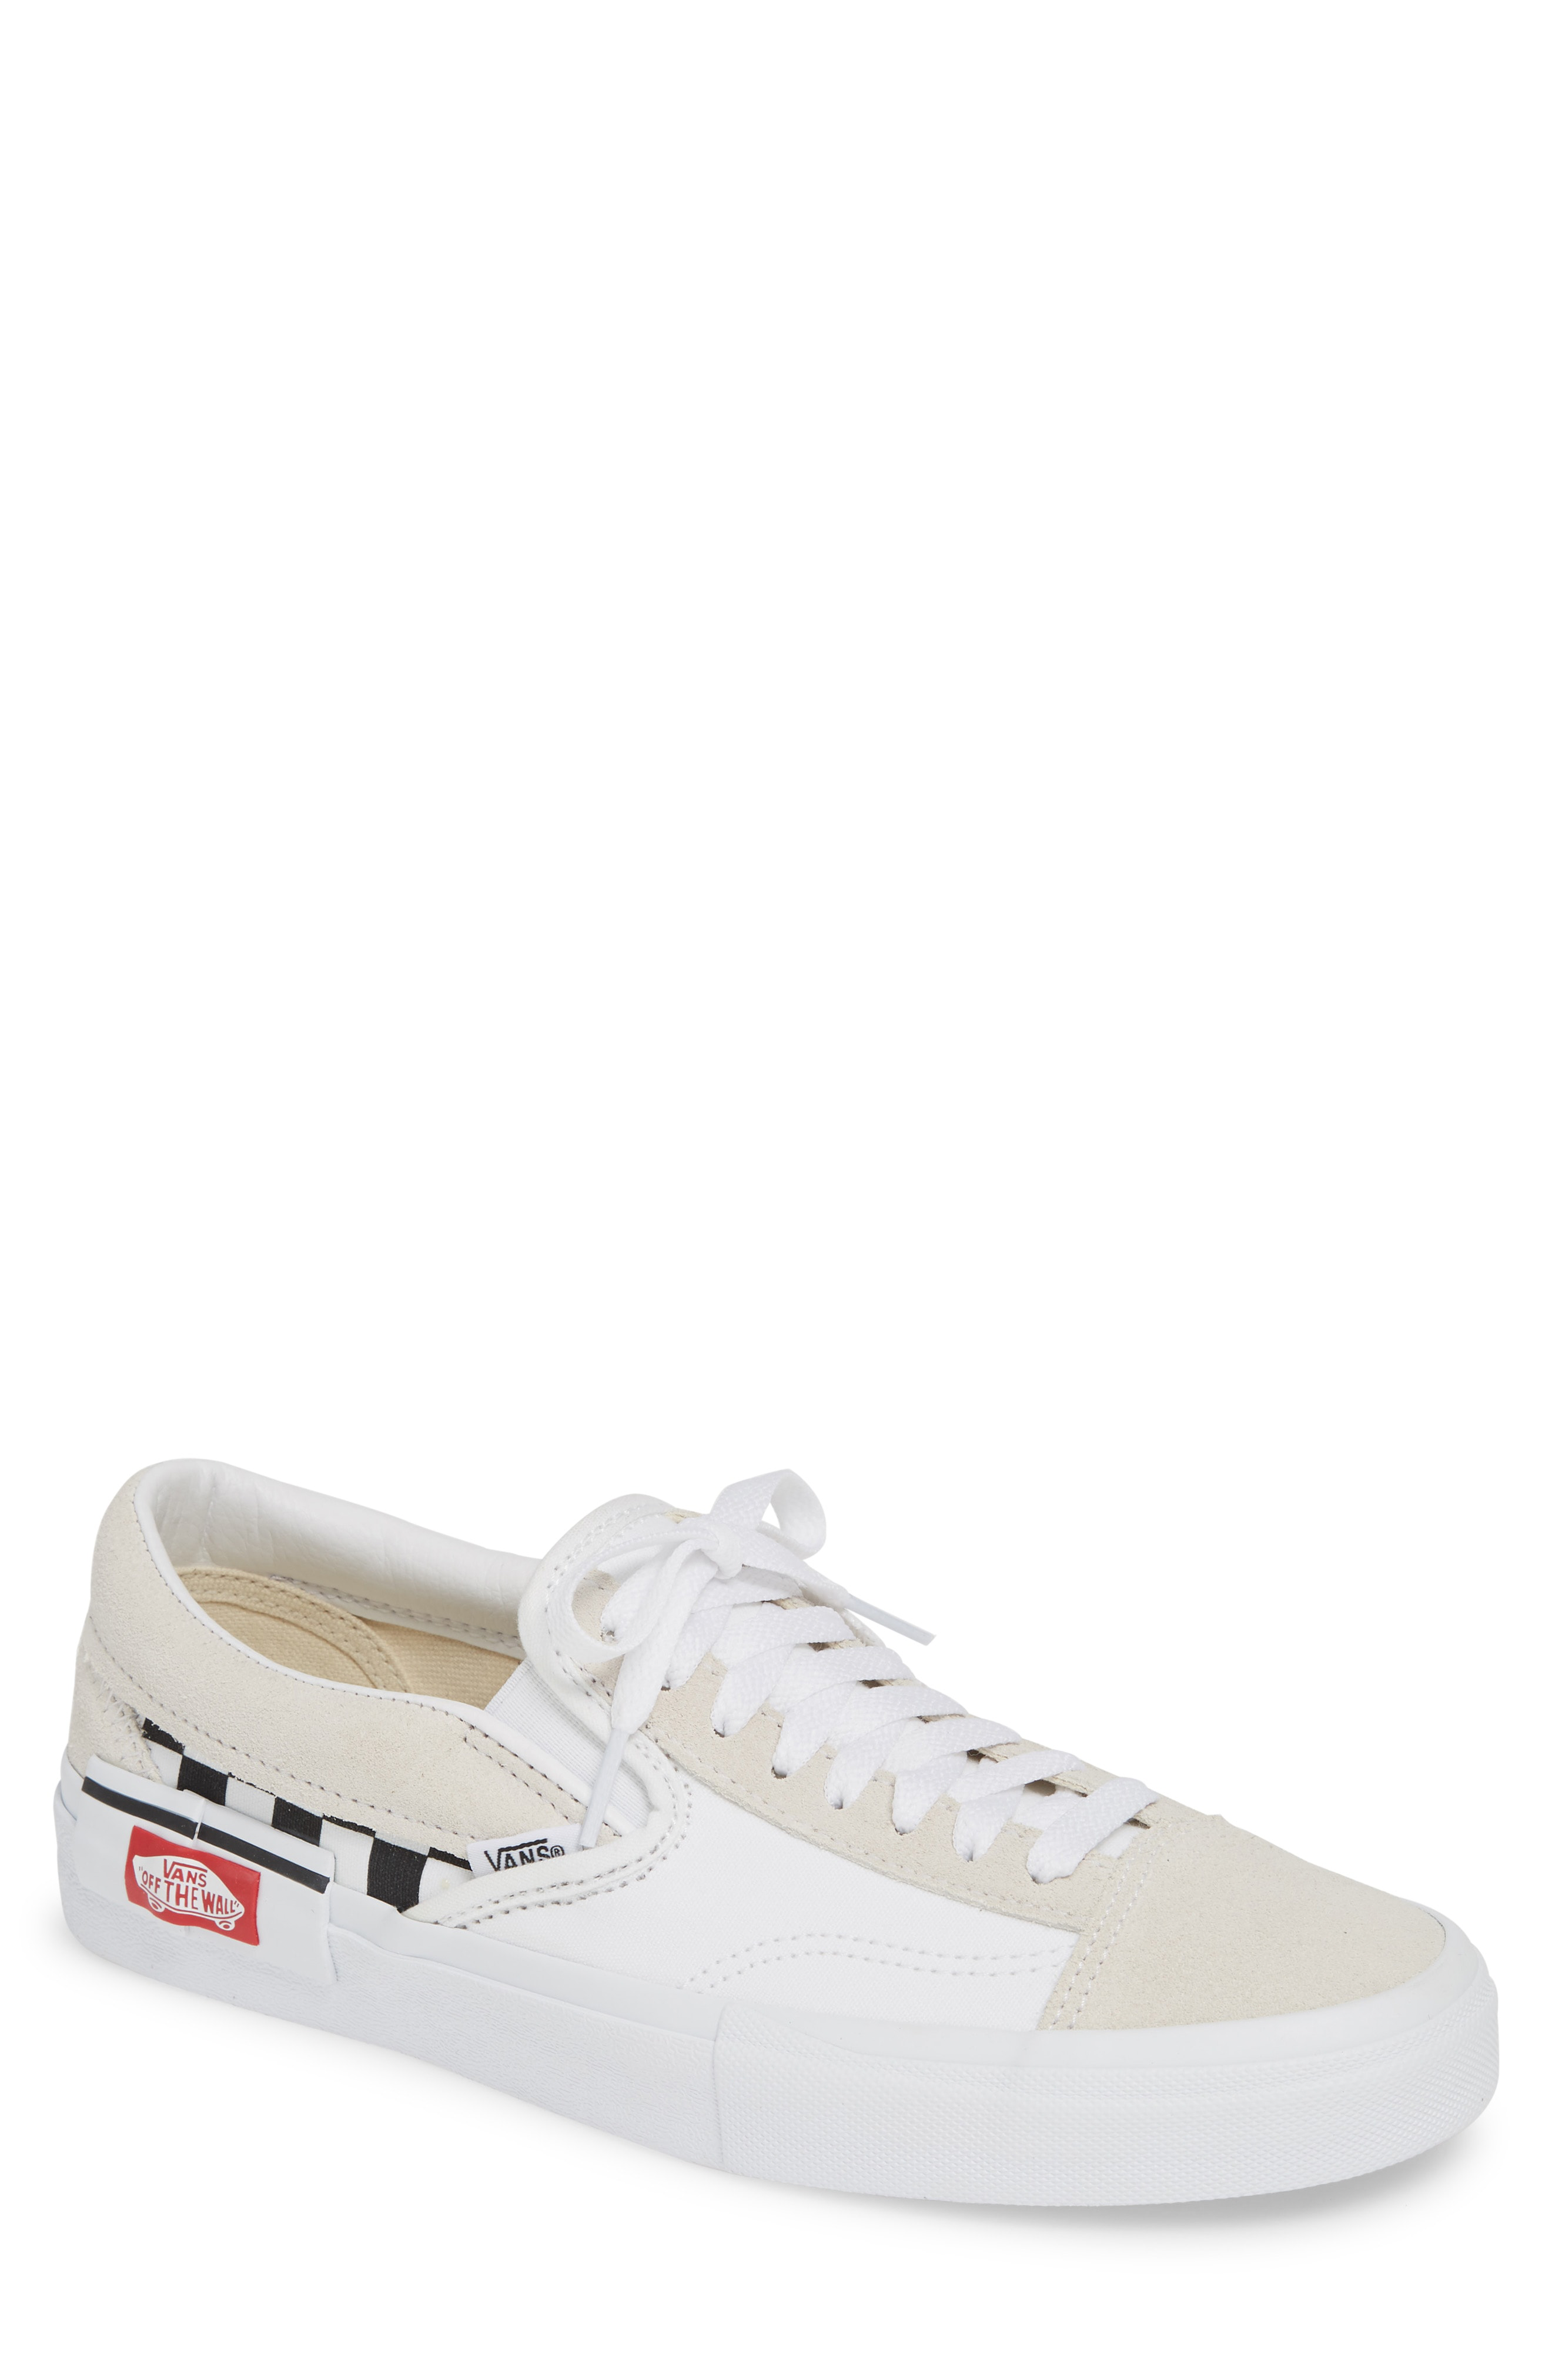 3420f9fbcd9e8 Vans Cap Sneaker In True White/ Black Checkerboard | ModeSens